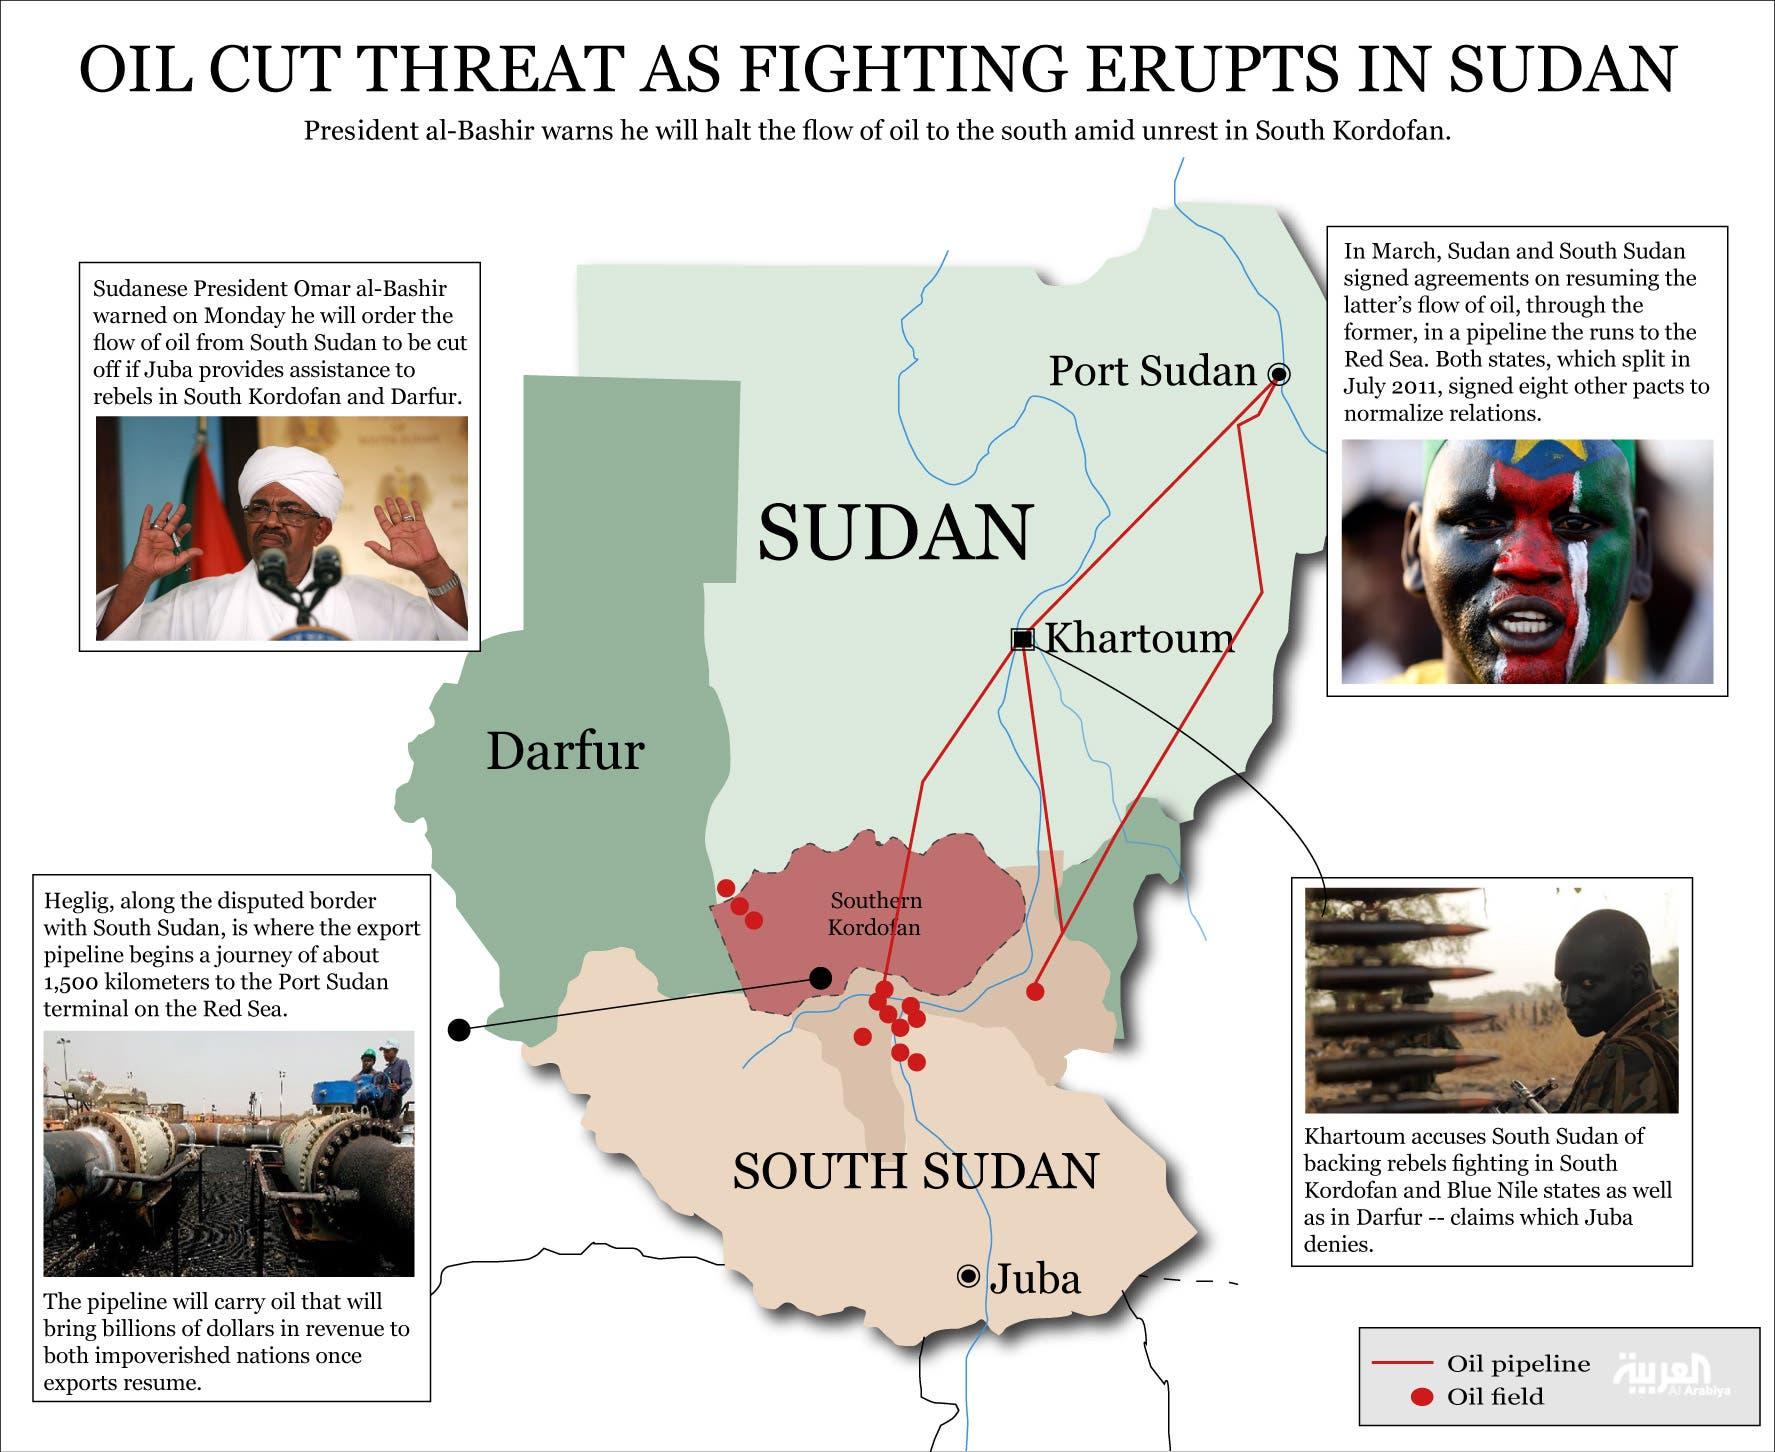 Info graphic: Oil cut threat as fighting erupts in Sudan (Design by Farwa Rizwan / Al Arabiya English)